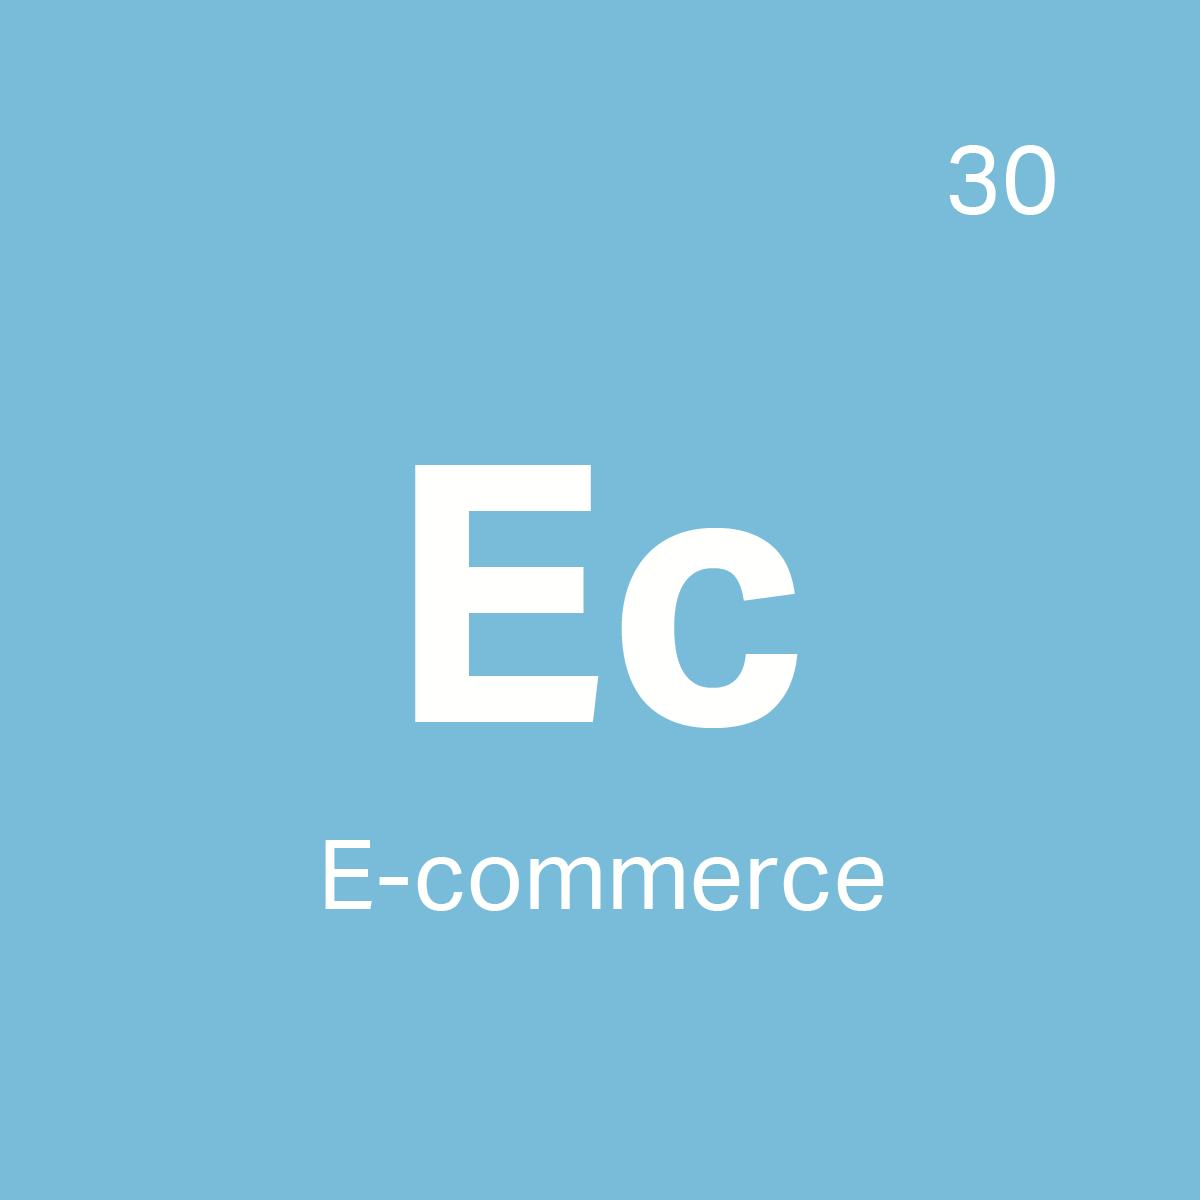 Curso E-commerce - 4ED escola de design